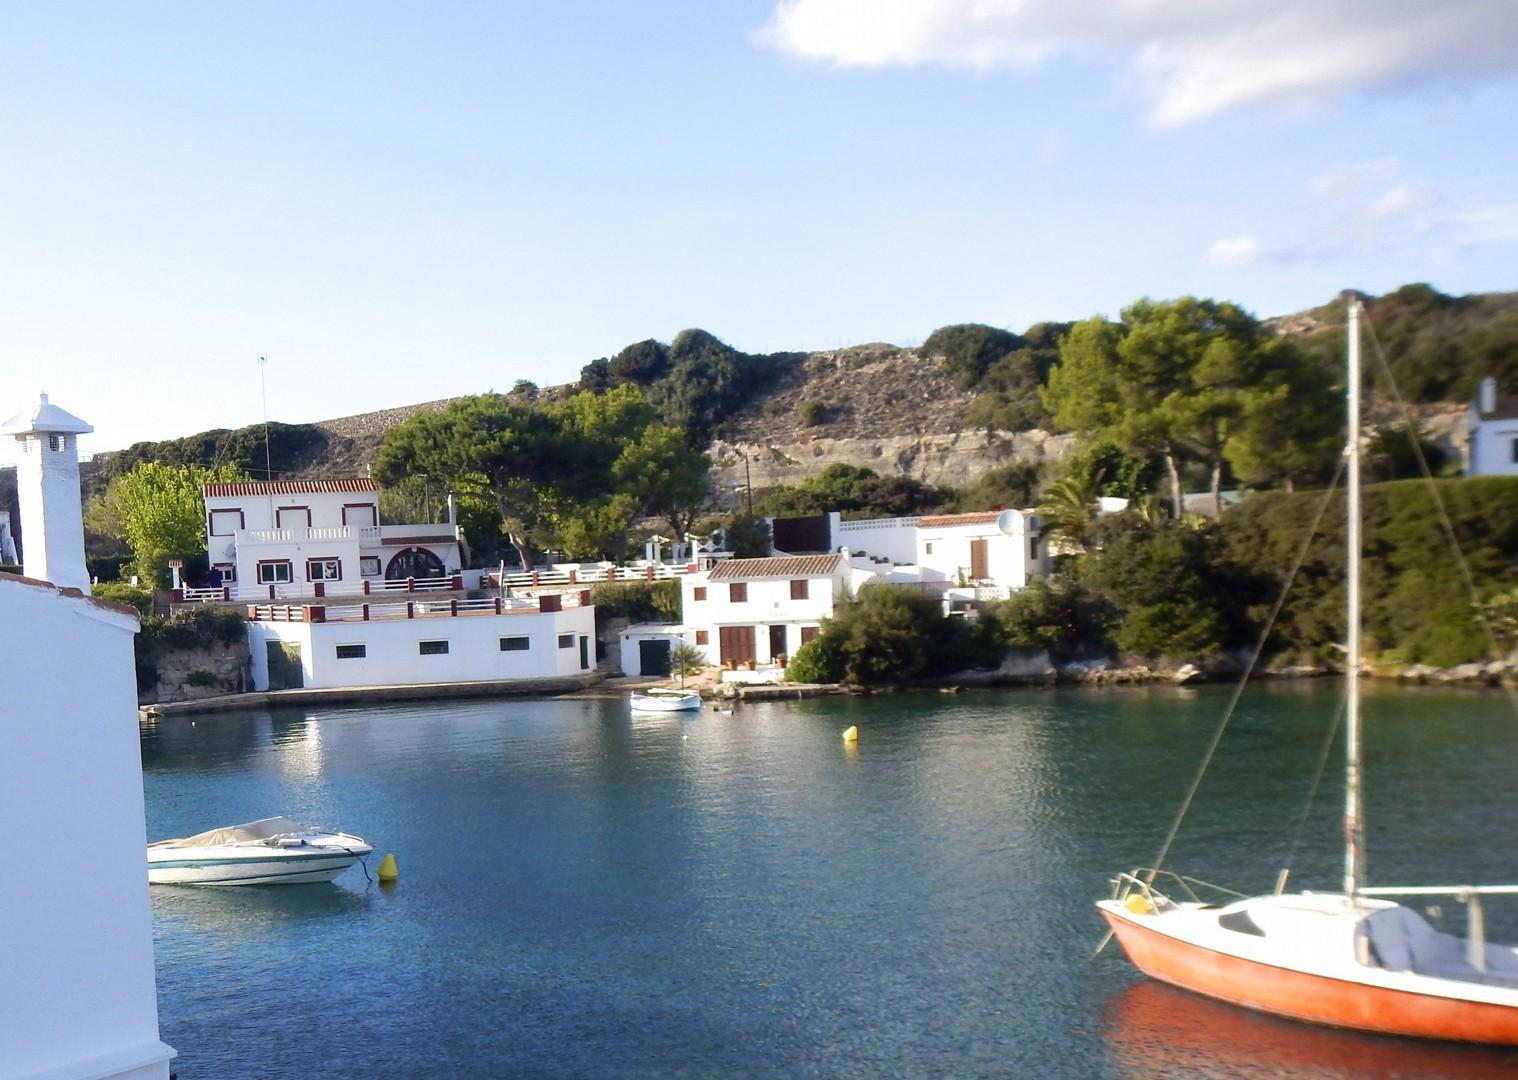 mountain-biking-holiday-menorca-coast-port.jpg - Spain - Menorca - Cami de Cavalls - Guided Mountain Bike Holiday - Mountain Biking